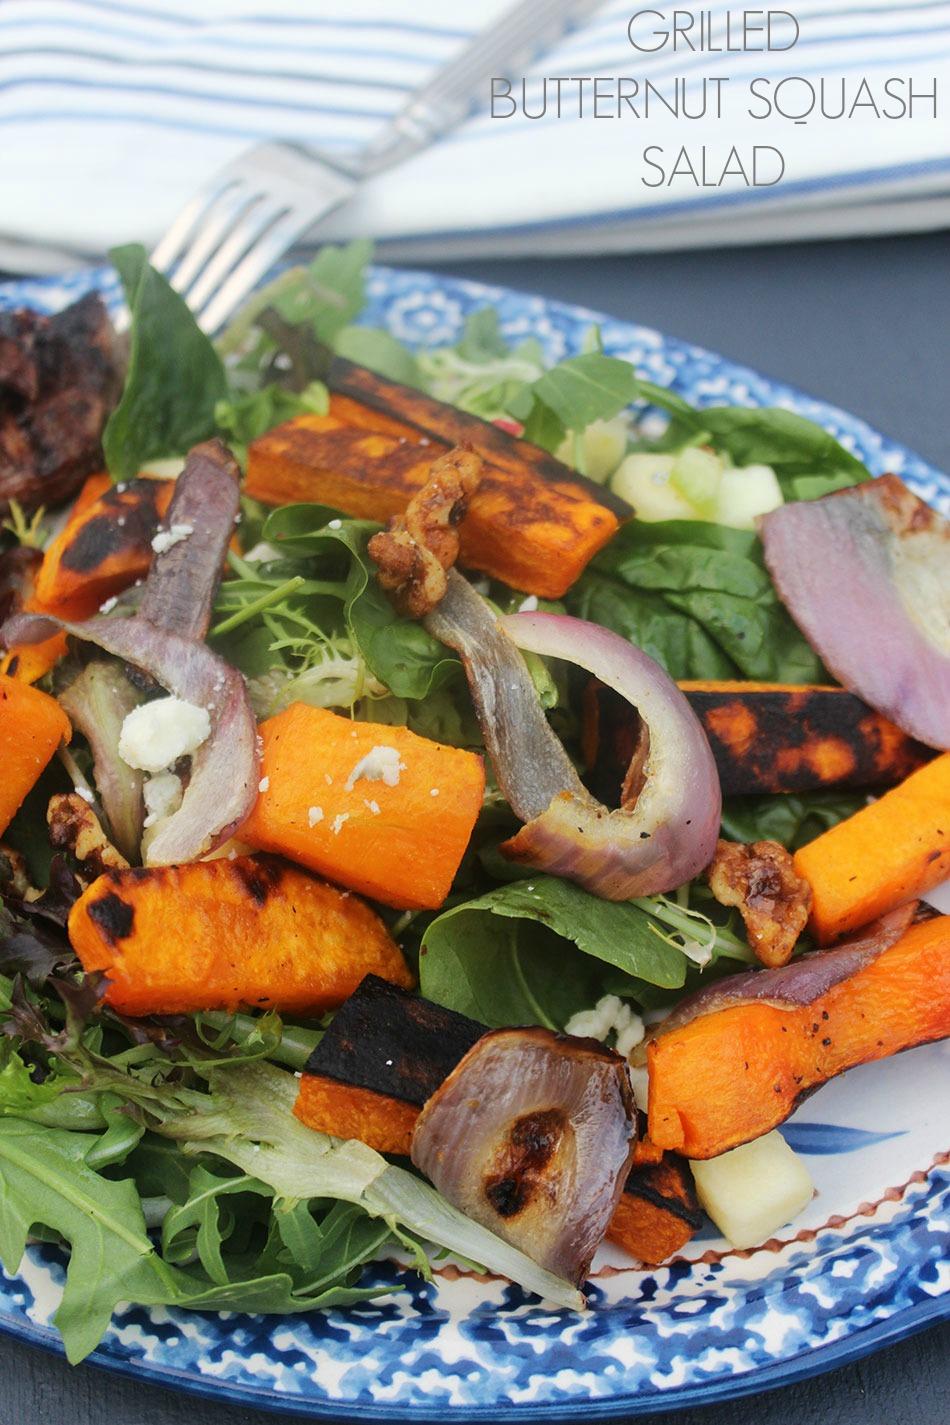 Grilled Butternut Squash Salad